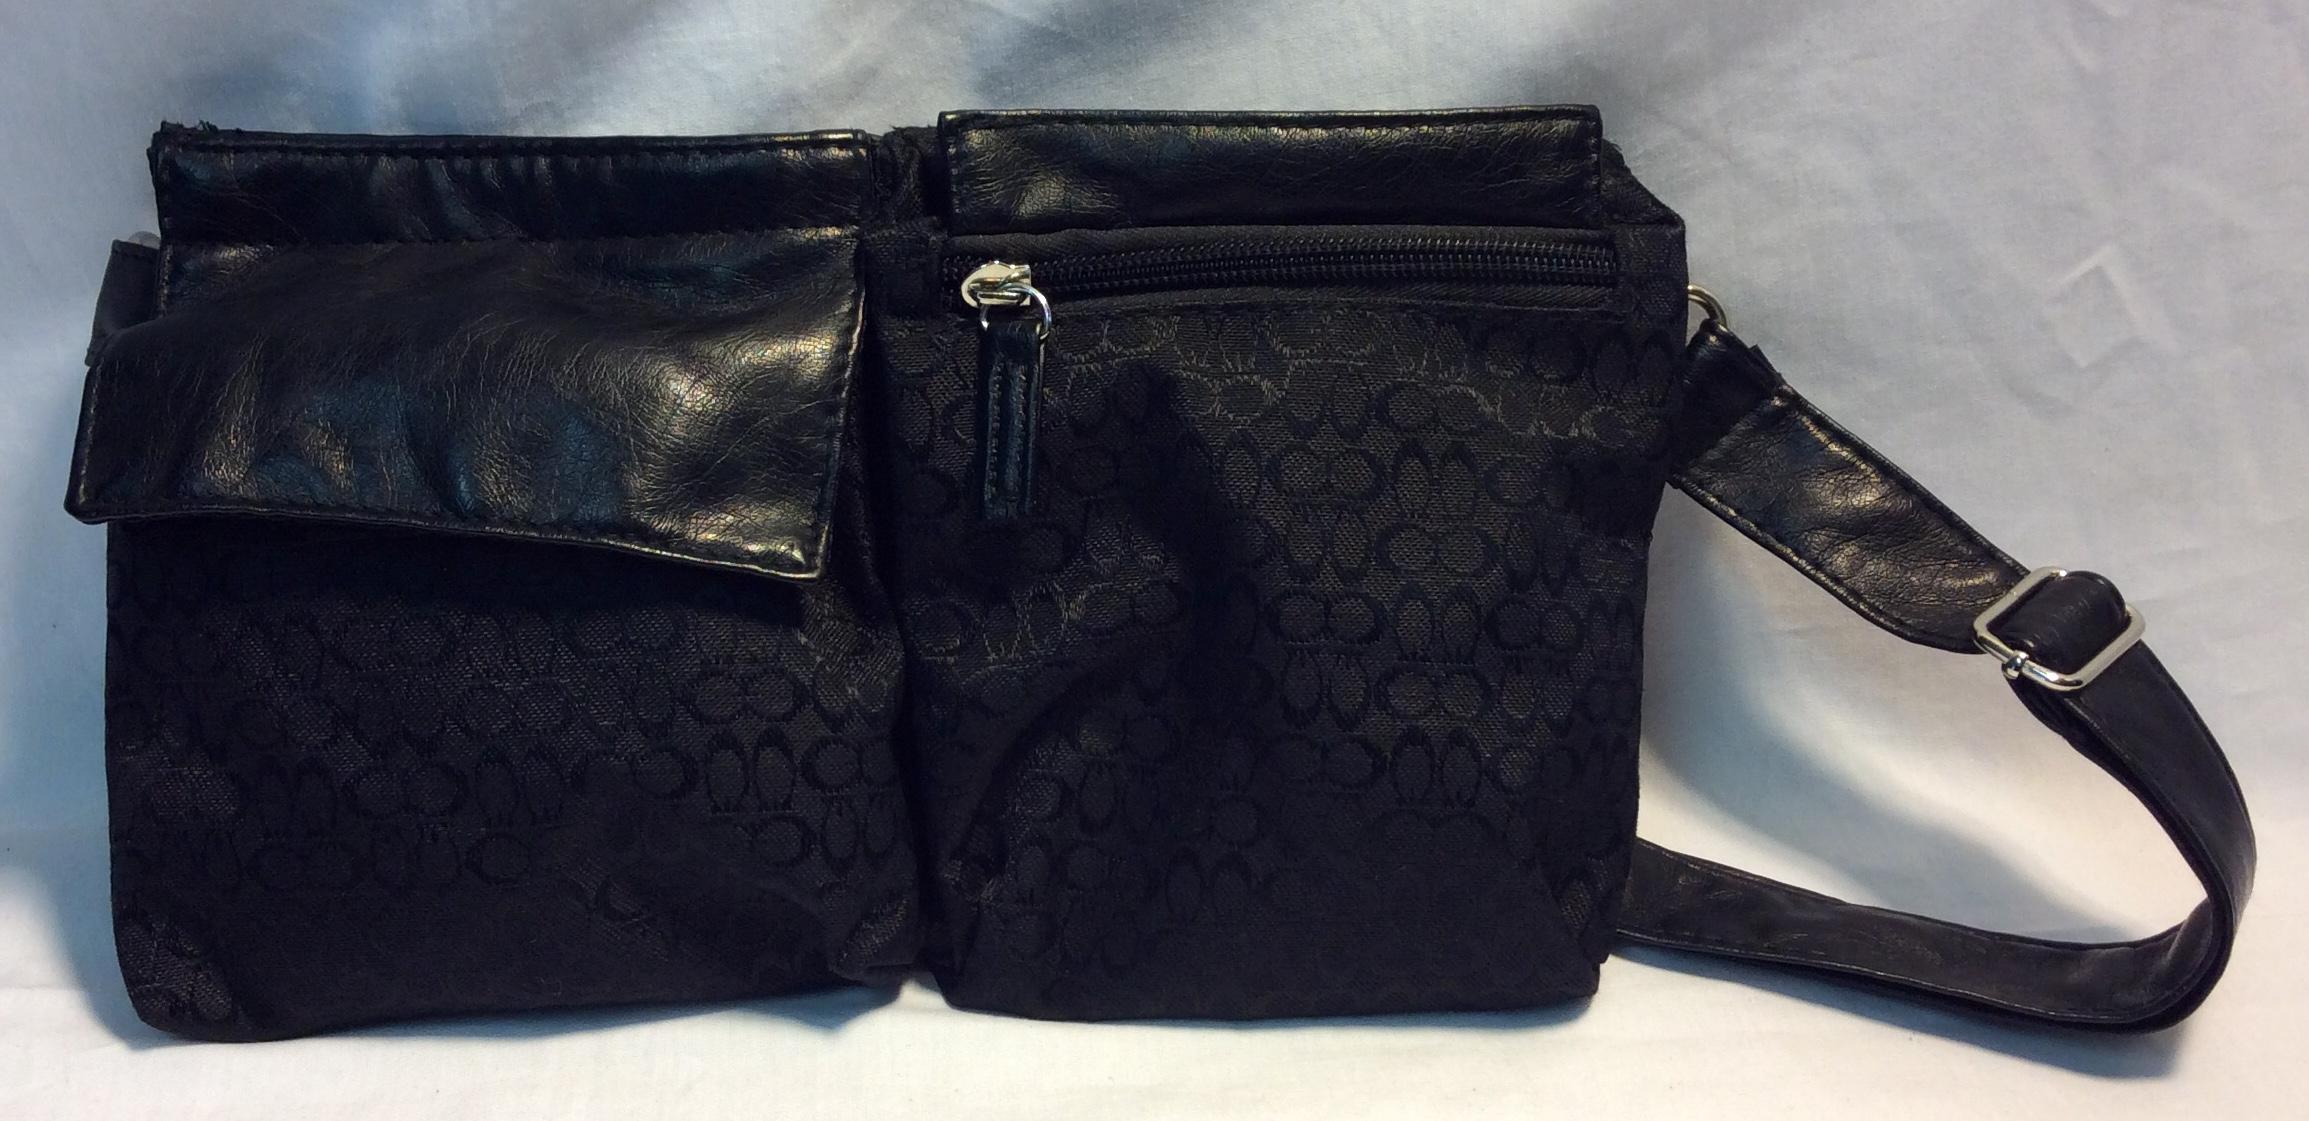 Black patterened fanny pack